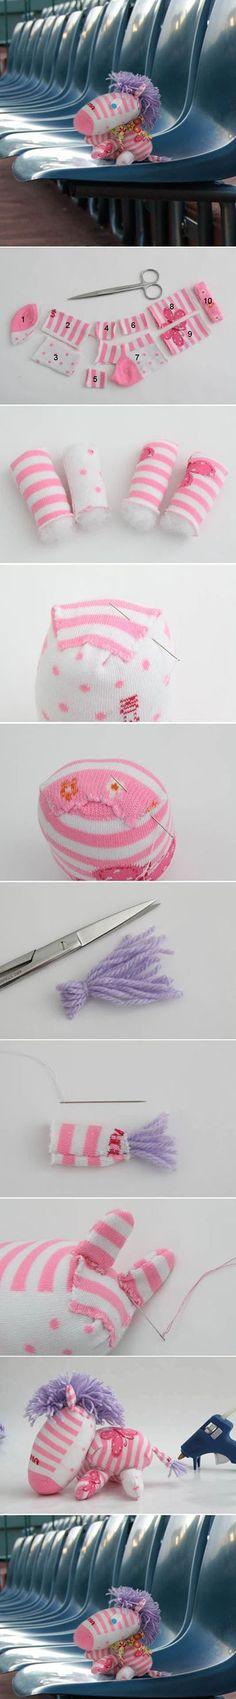 10 DIY Little Sock Zebra DIY Projects c12b | DIY